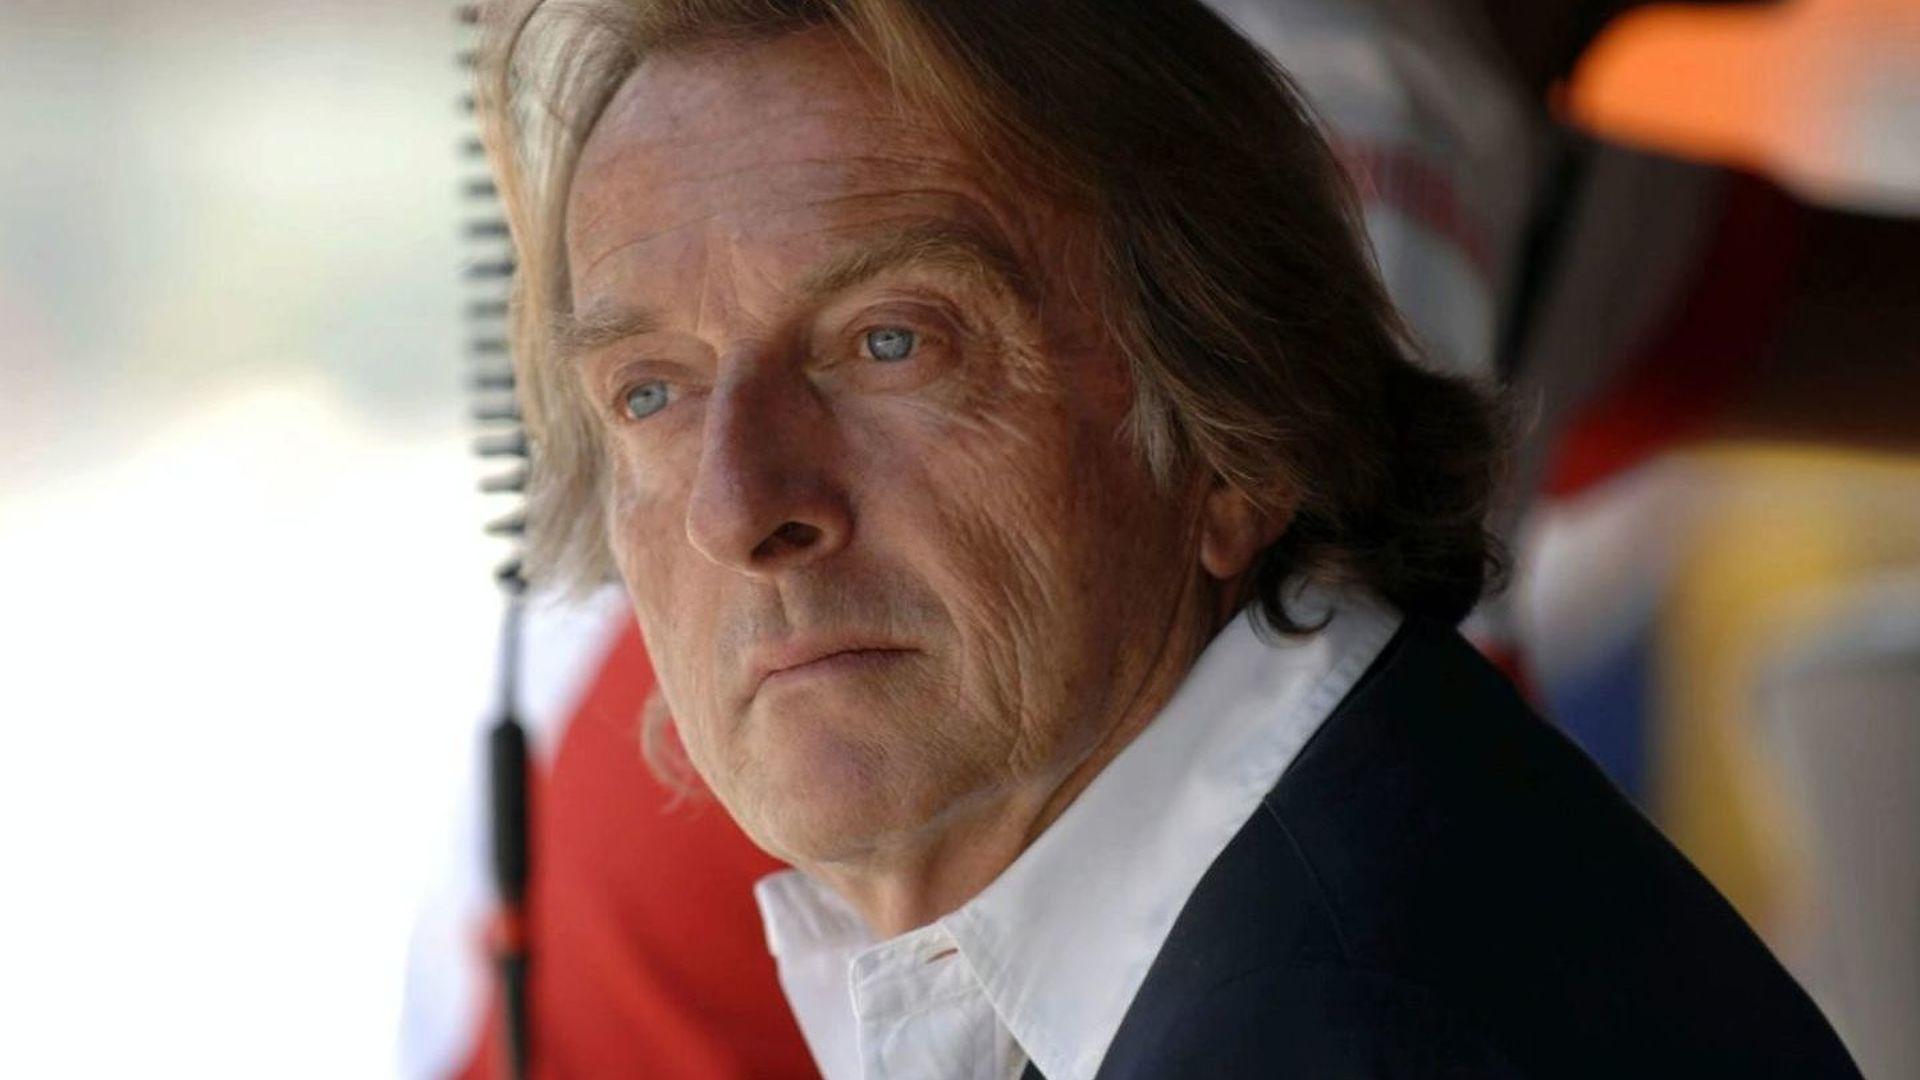 Ferrari warns FIA about team 'trickery' in 2014